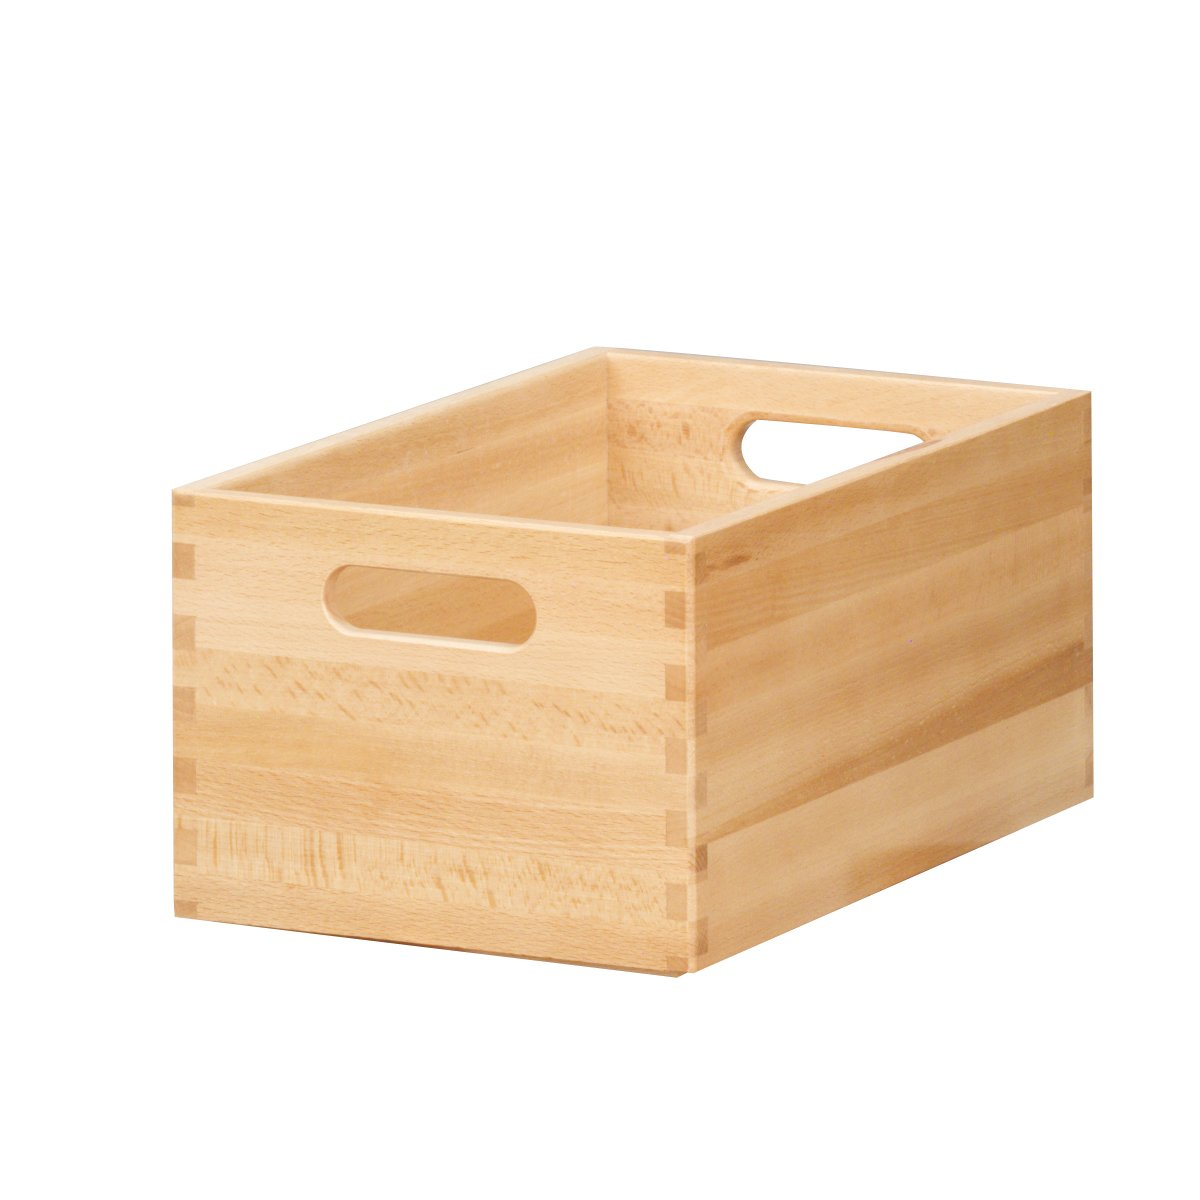 Zeller 13306 - Cajón multiusos de madera de haya barnizada